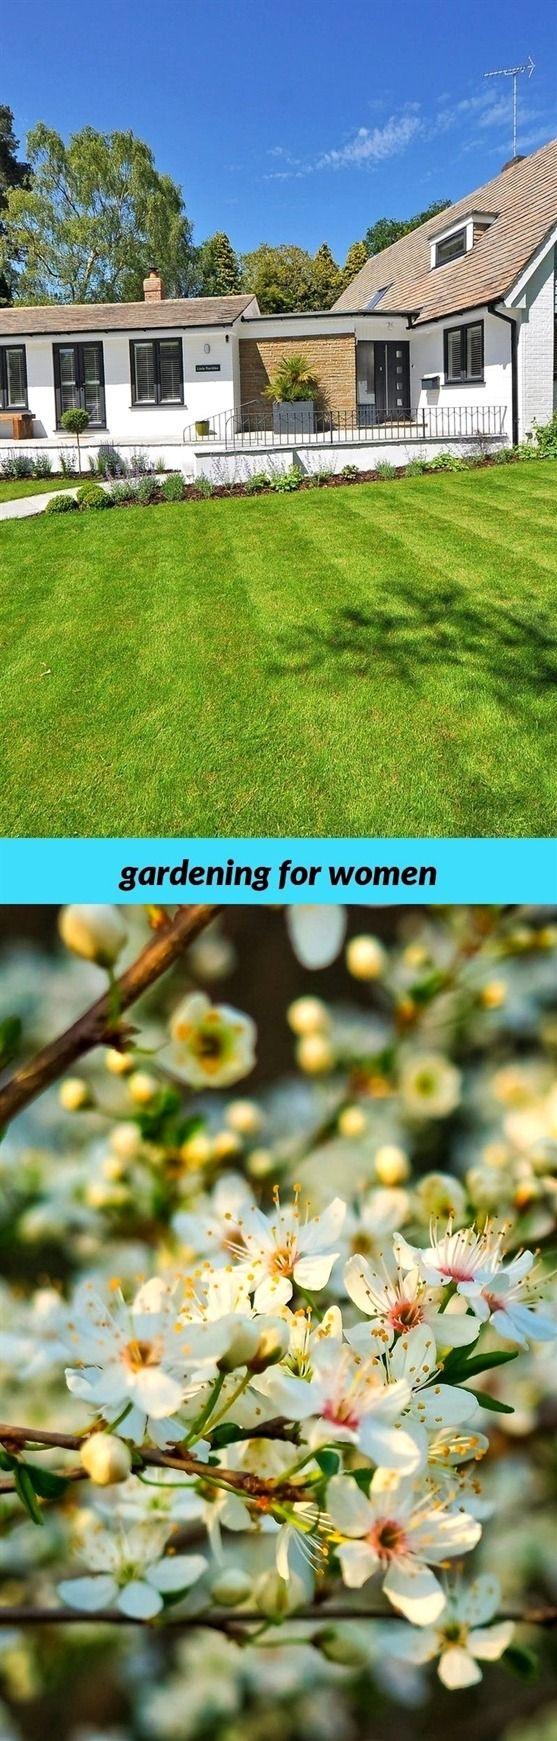 Gardening For Women 272 20180915175720 53 Container Gardening In